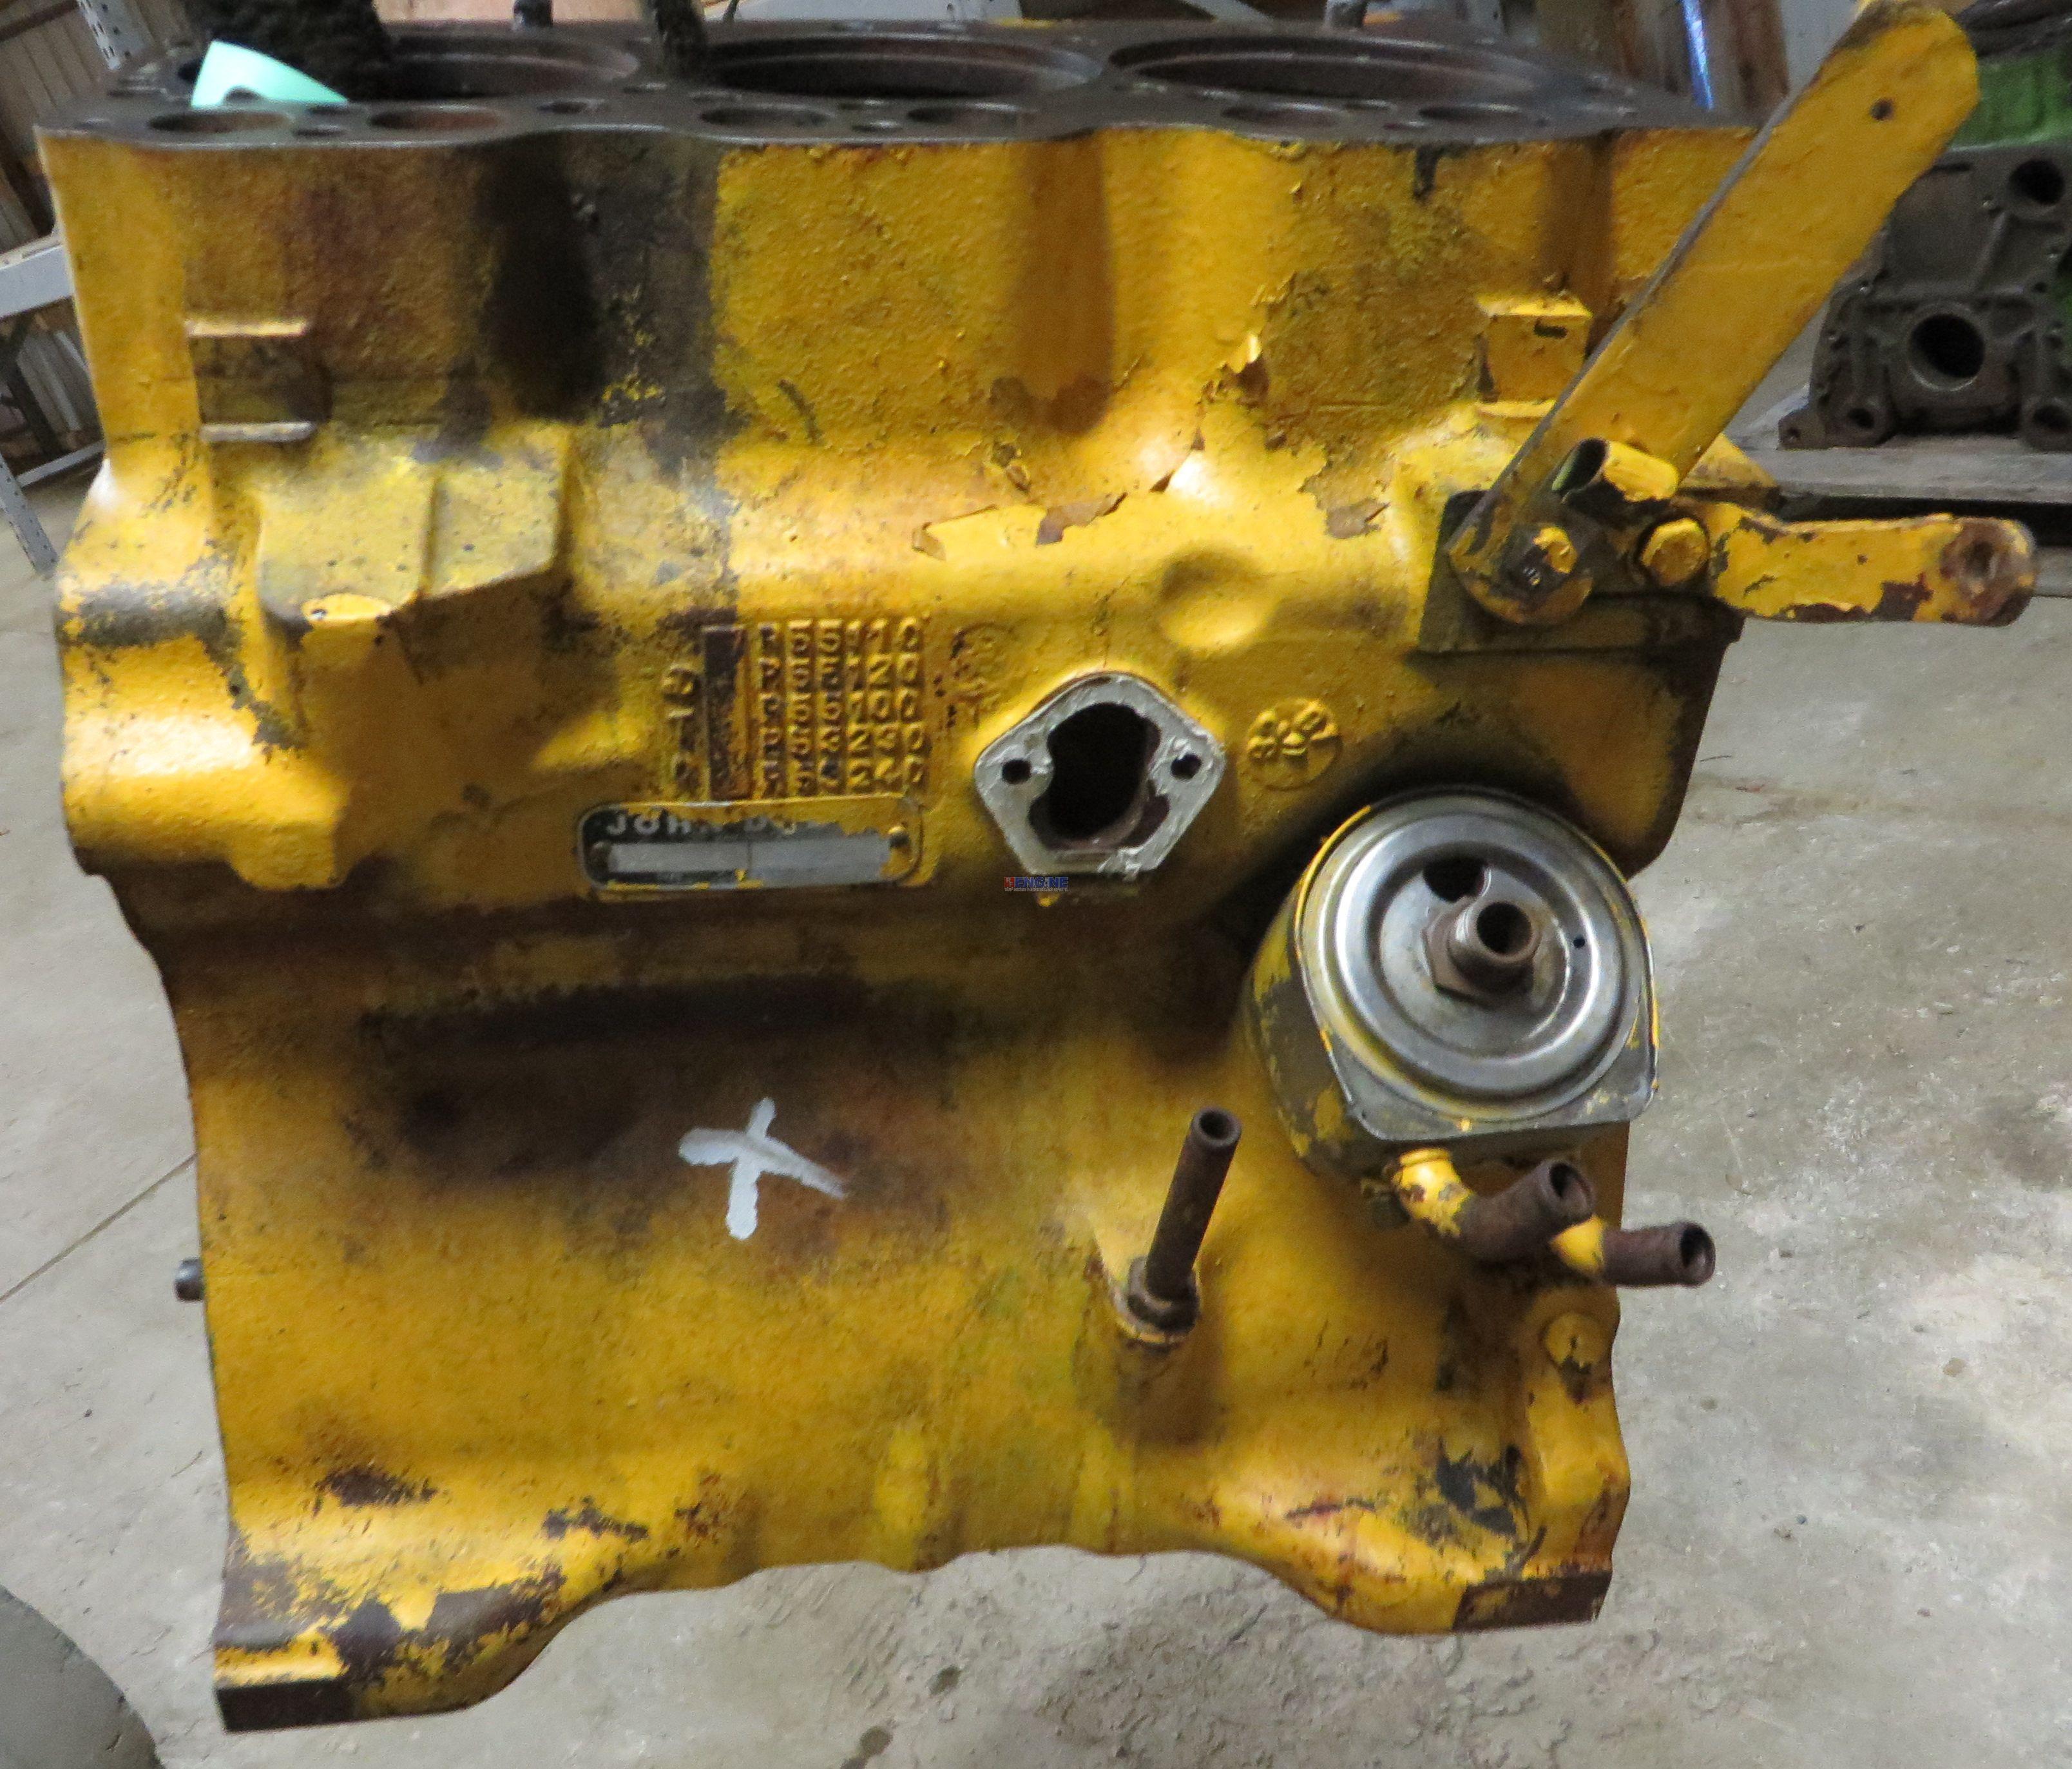 John Deere Jd 3 152 Engine Block Good Used R55110 3 Cyl